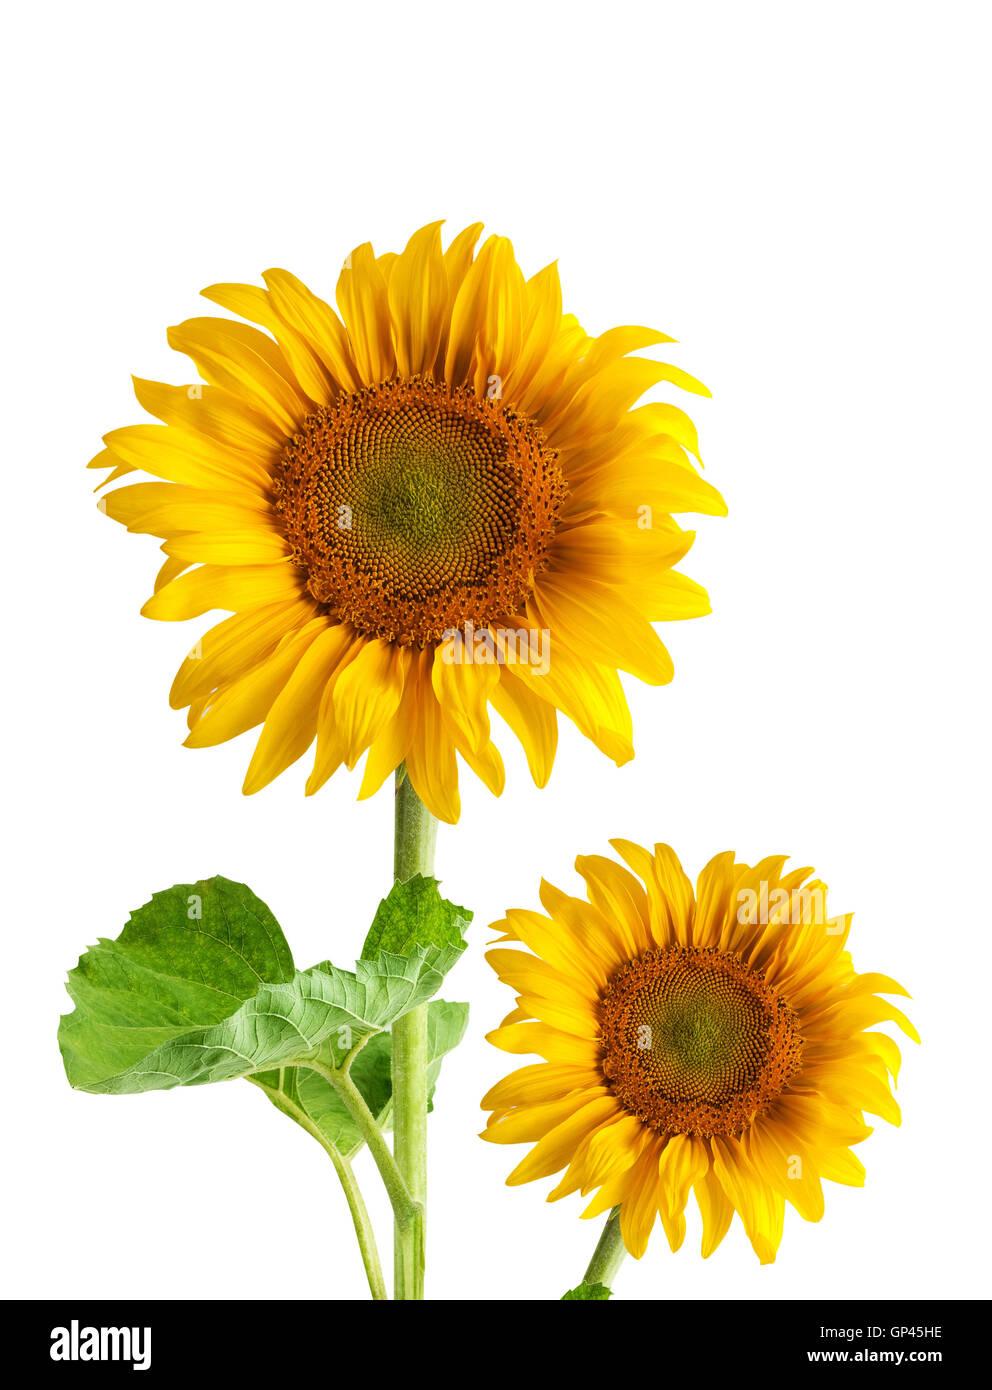 Beautiful Sunflower Frame Isolated Stock Photos & Beautiful ...